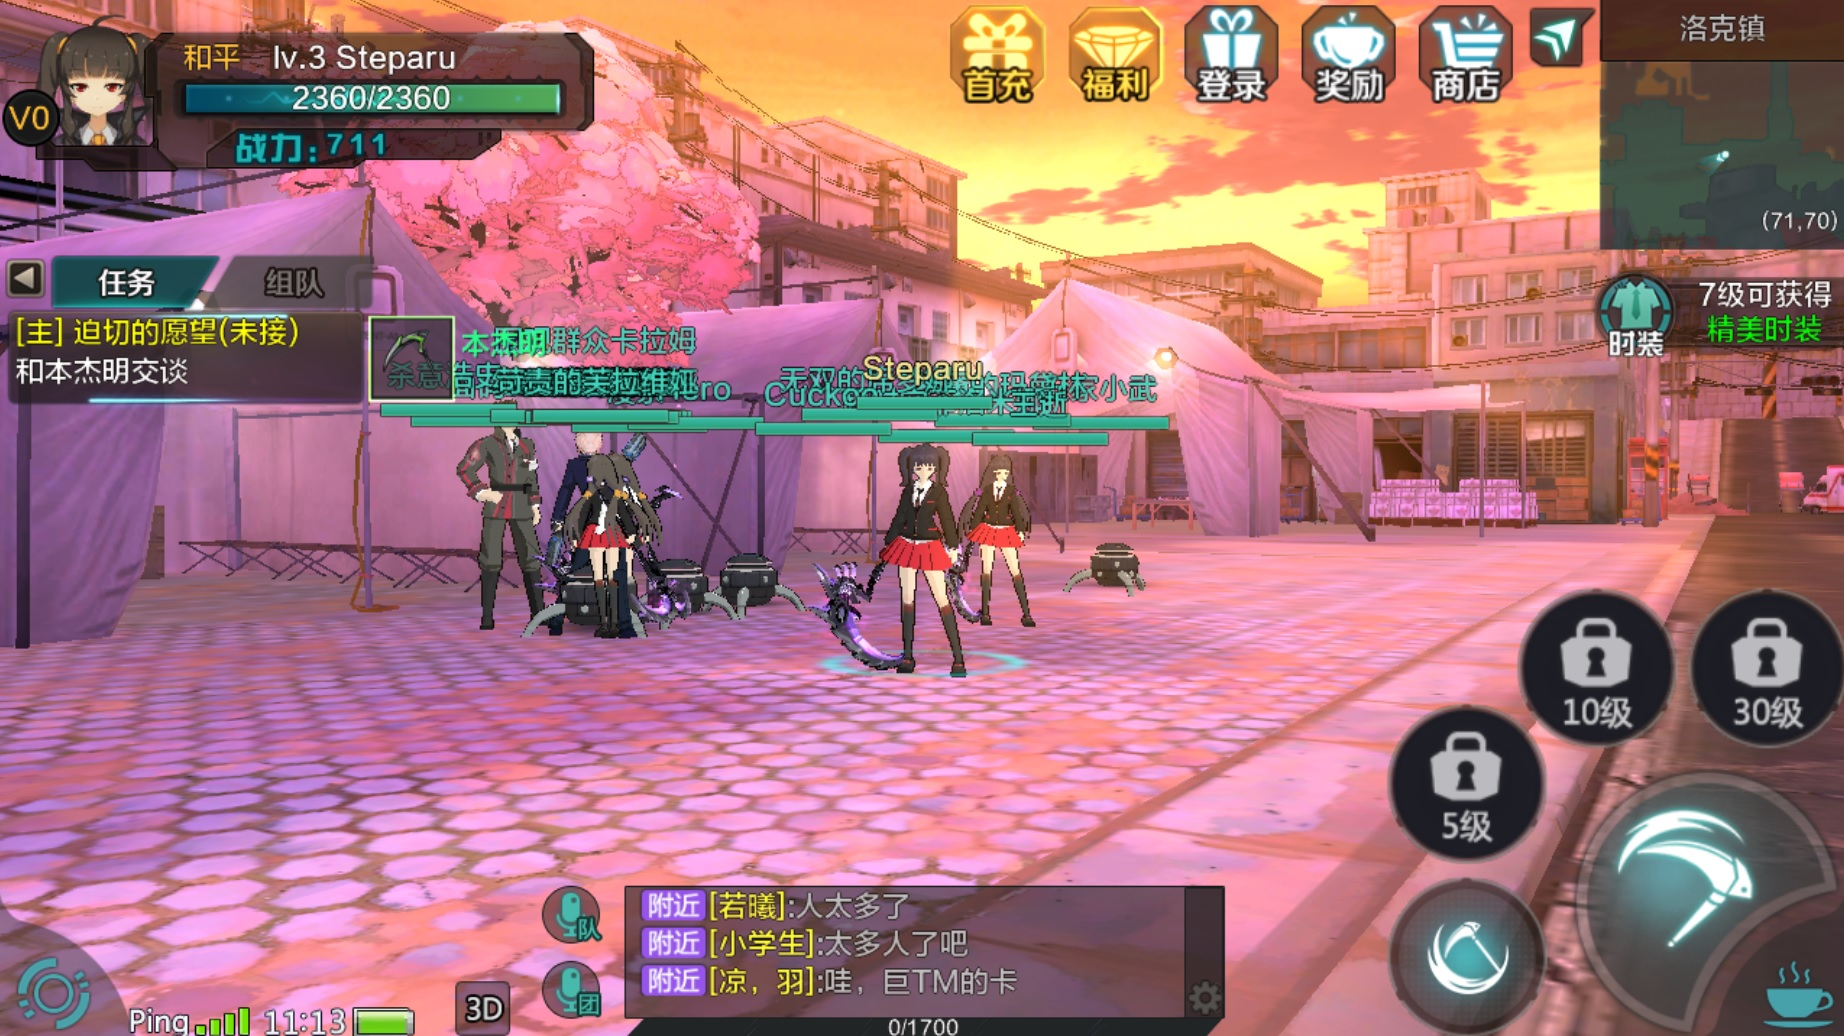 Download: http://www.9game.cn/linghunzuoshi/